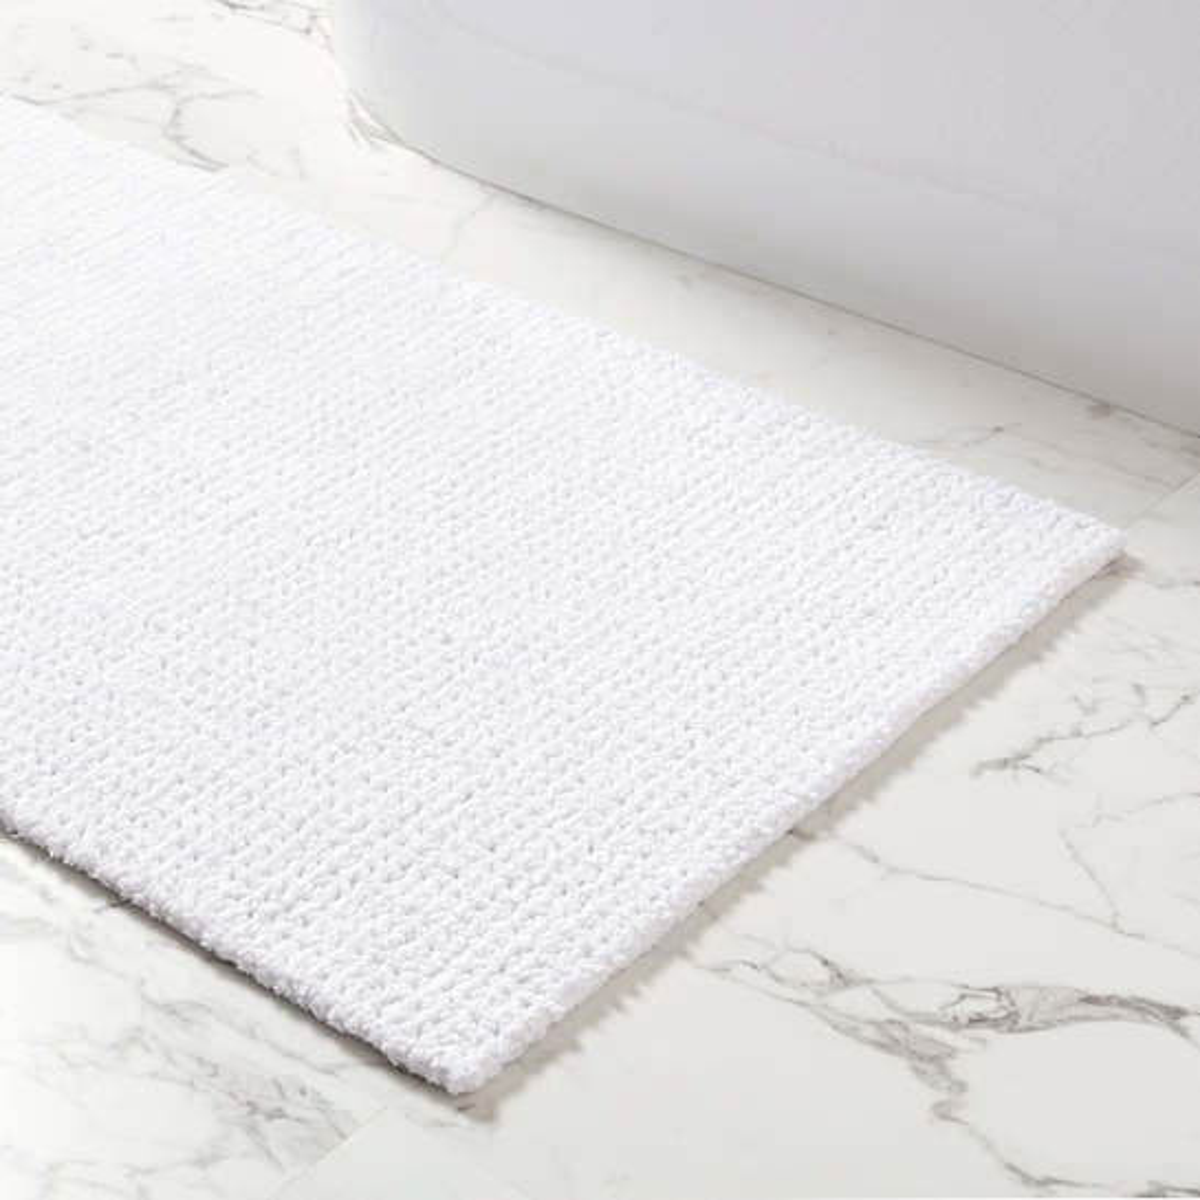 Modesto White Bath Rug